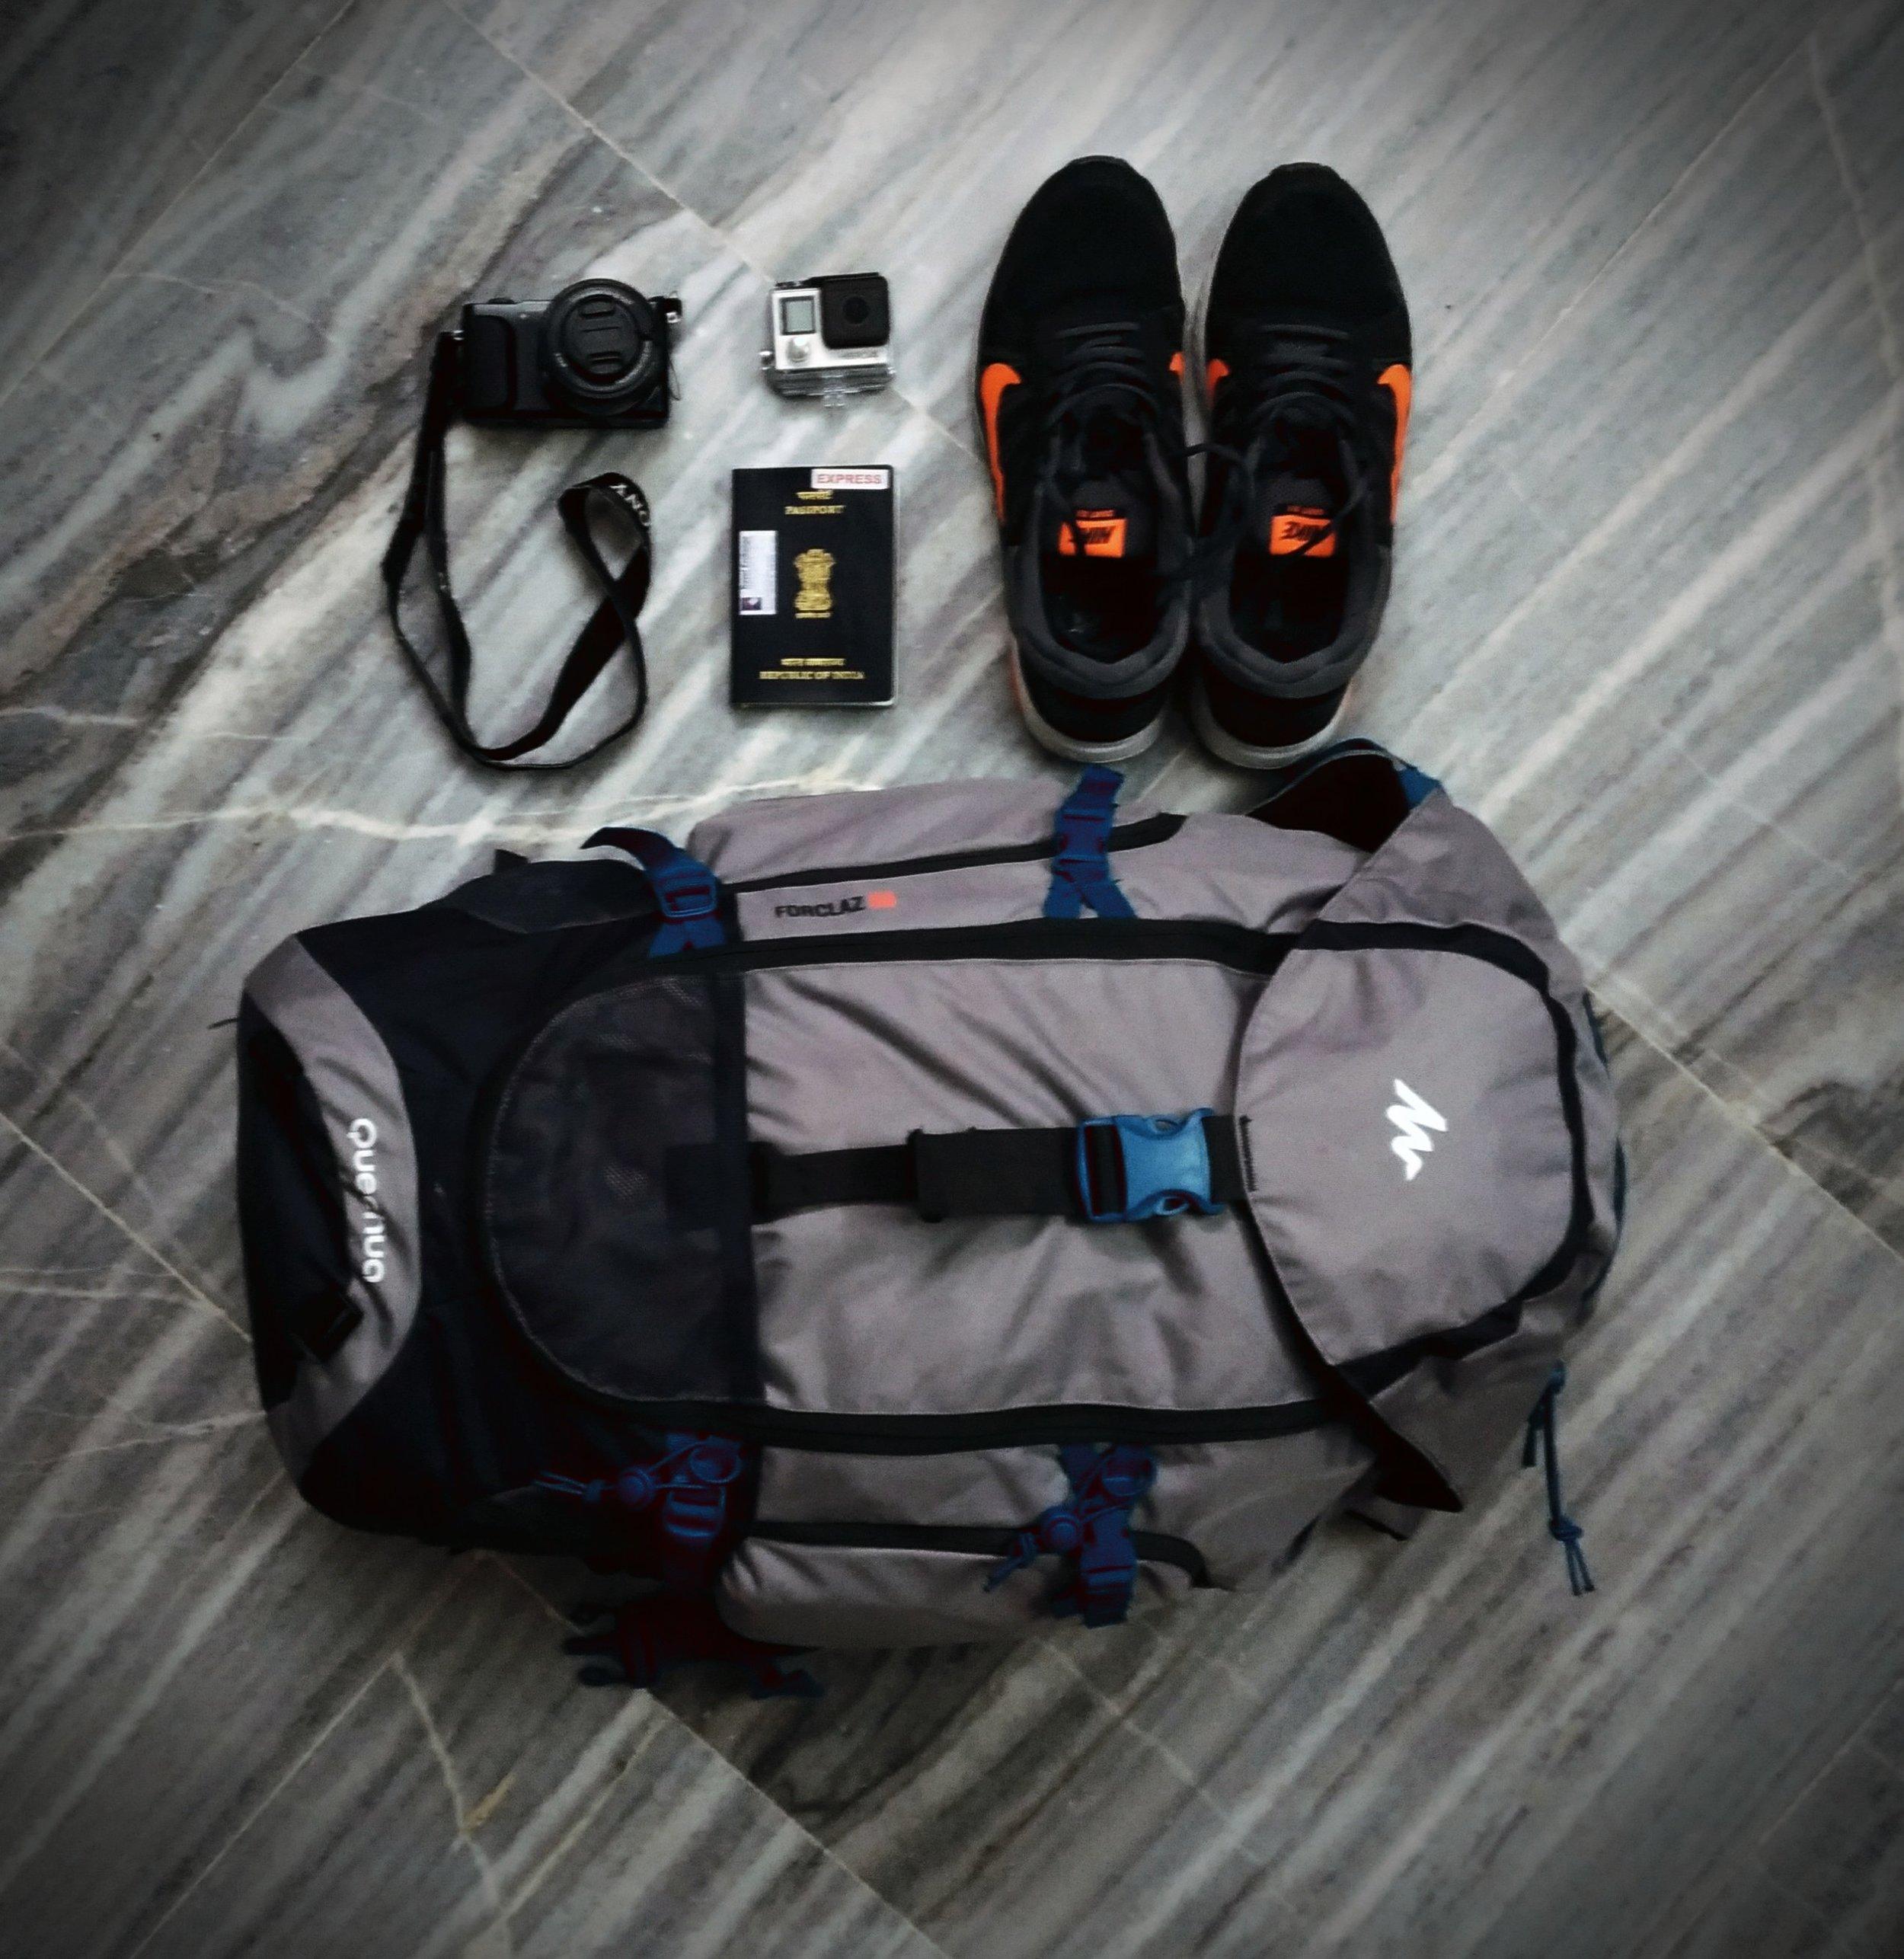 My gear for three weeks